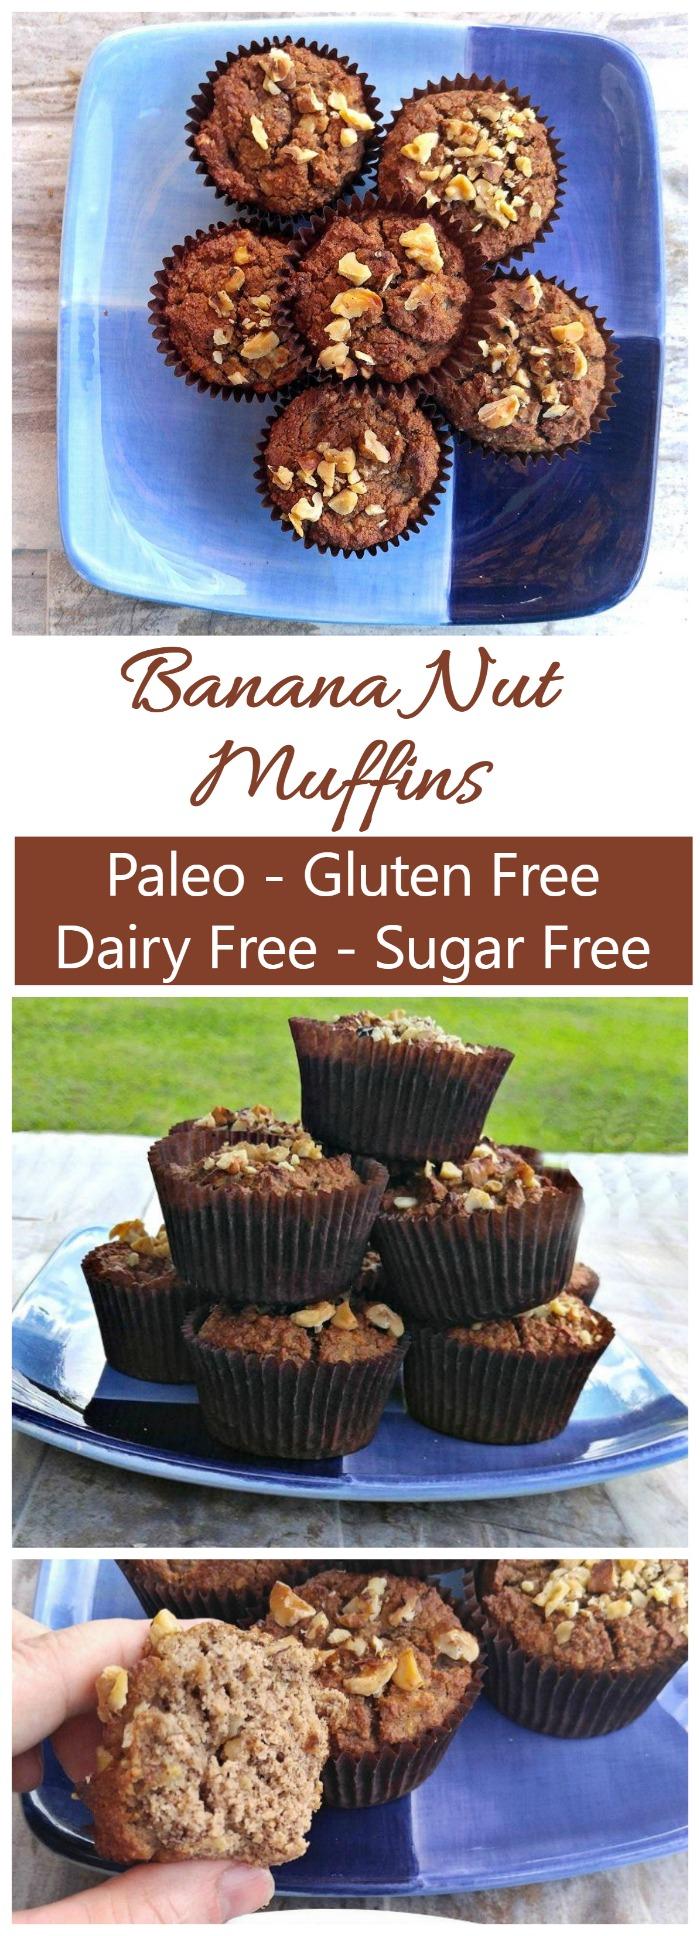 Paleo Banana Nut Muffins - Gluten Free - Sugar Free - Dairy Free